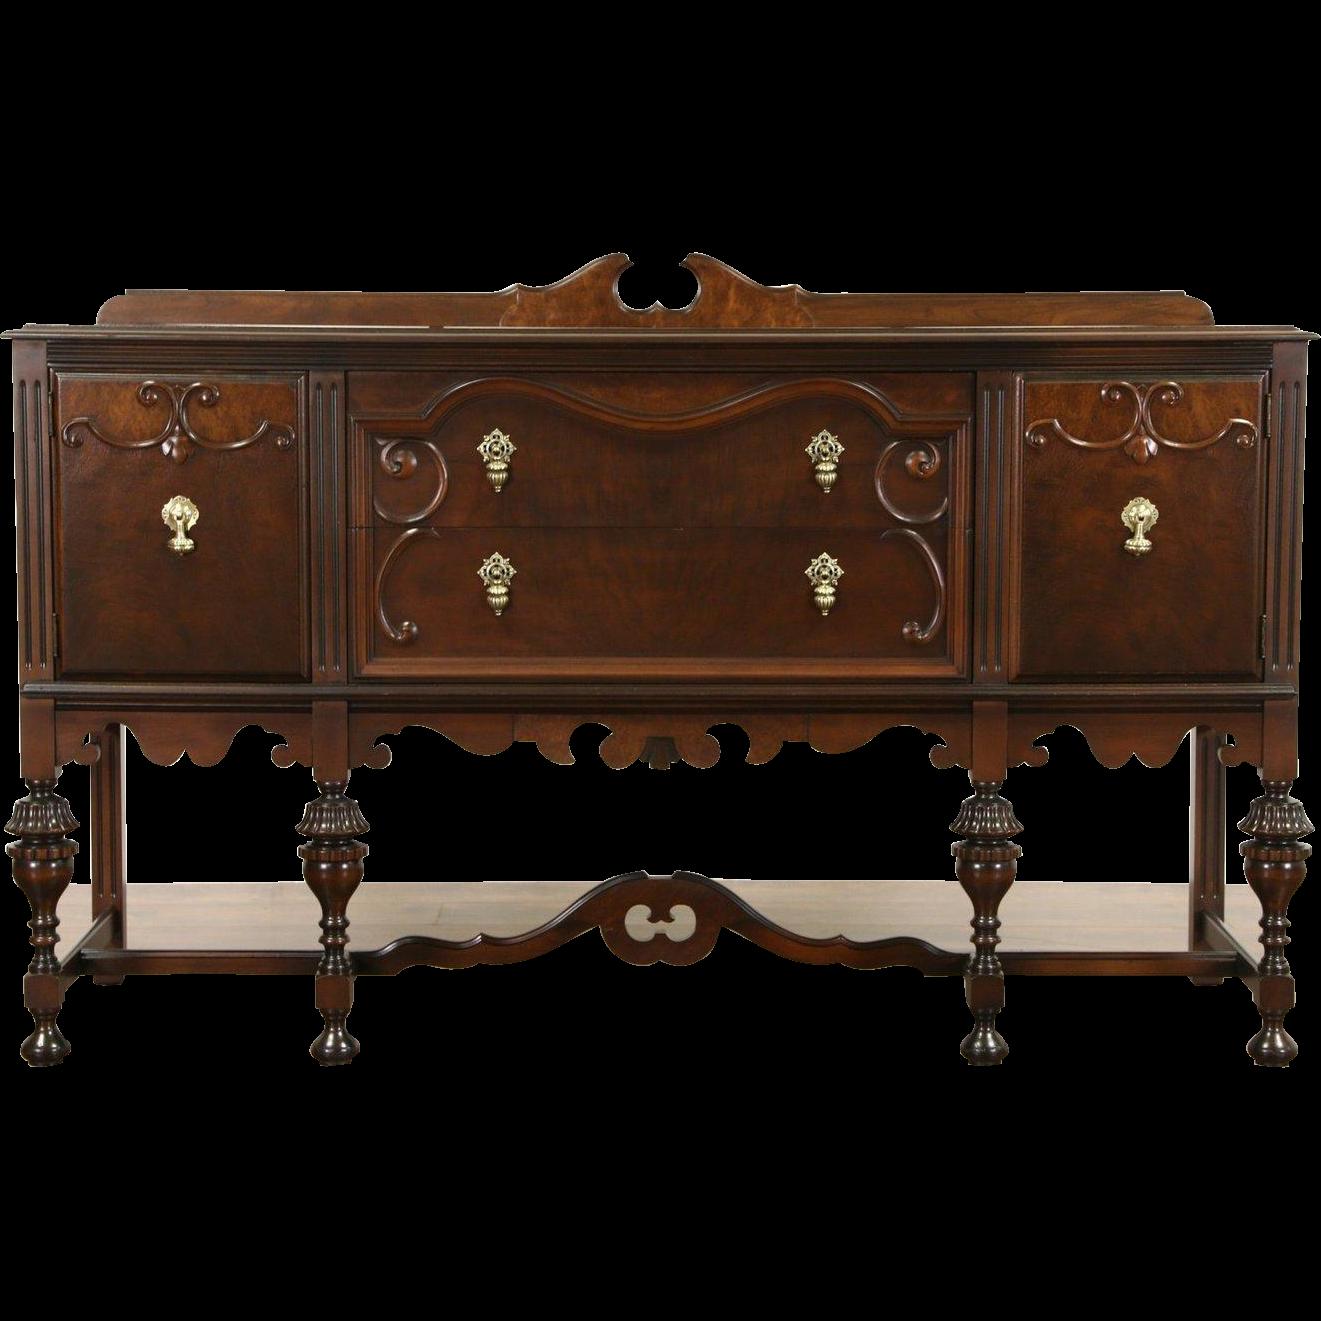 English Tudor 1920 Antique Walnut Sideboard Server or Buffet